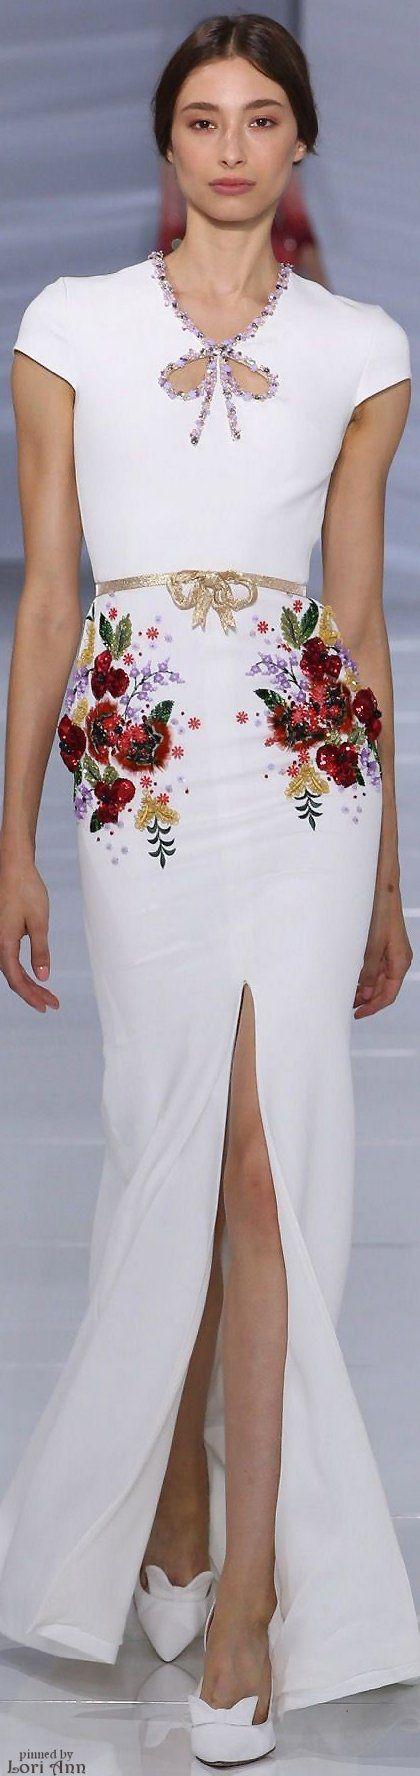 Georges Hobeika Couture Fall 2015